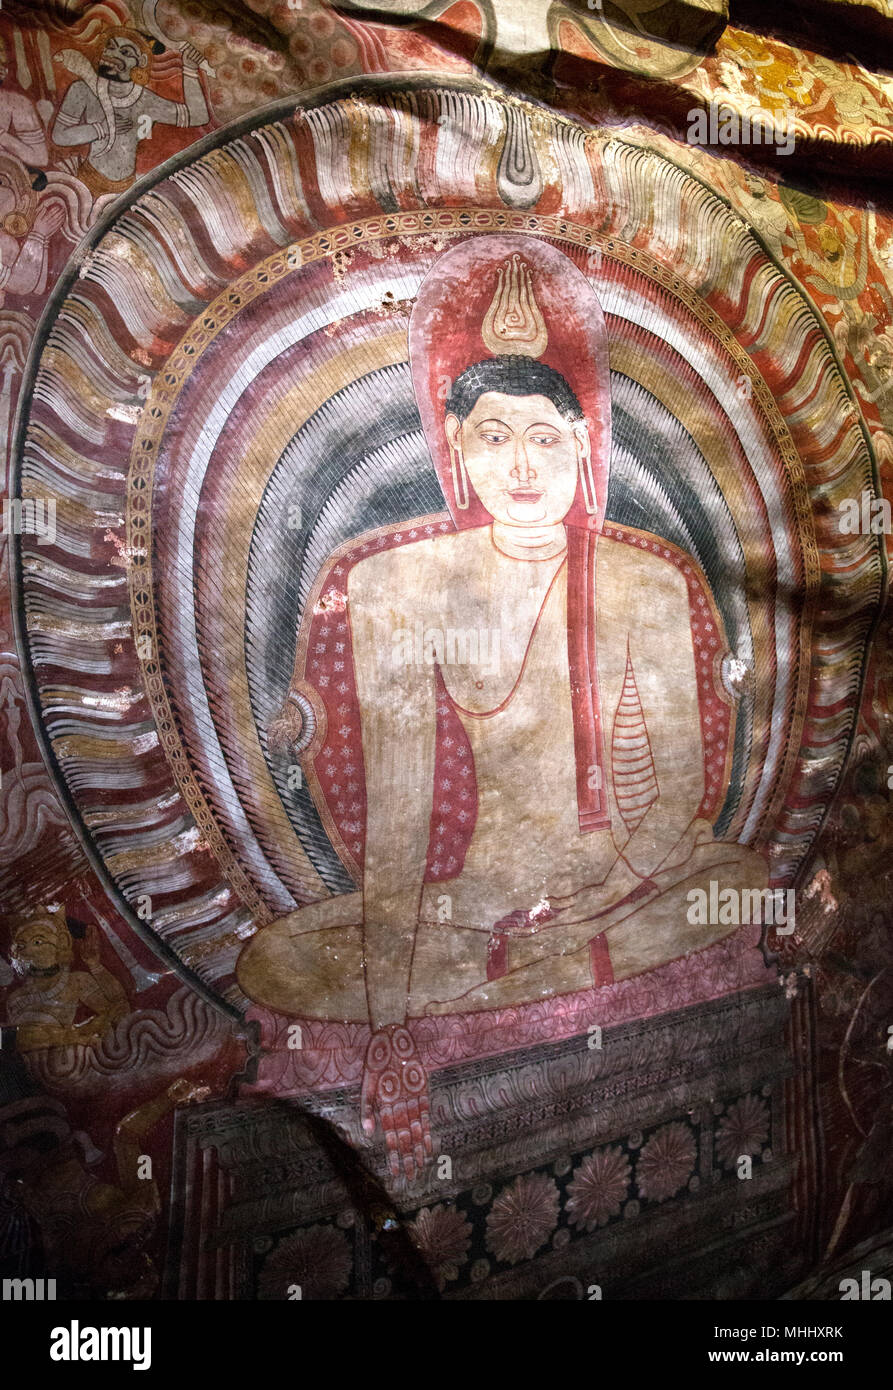 Dambulla Sri Lanka Dambulla Cave Temples - Cave II  Maharaja Viharaya Painting Of Buddha In Varada Mudra Gesture Of Charity And Compassion - Stock Image